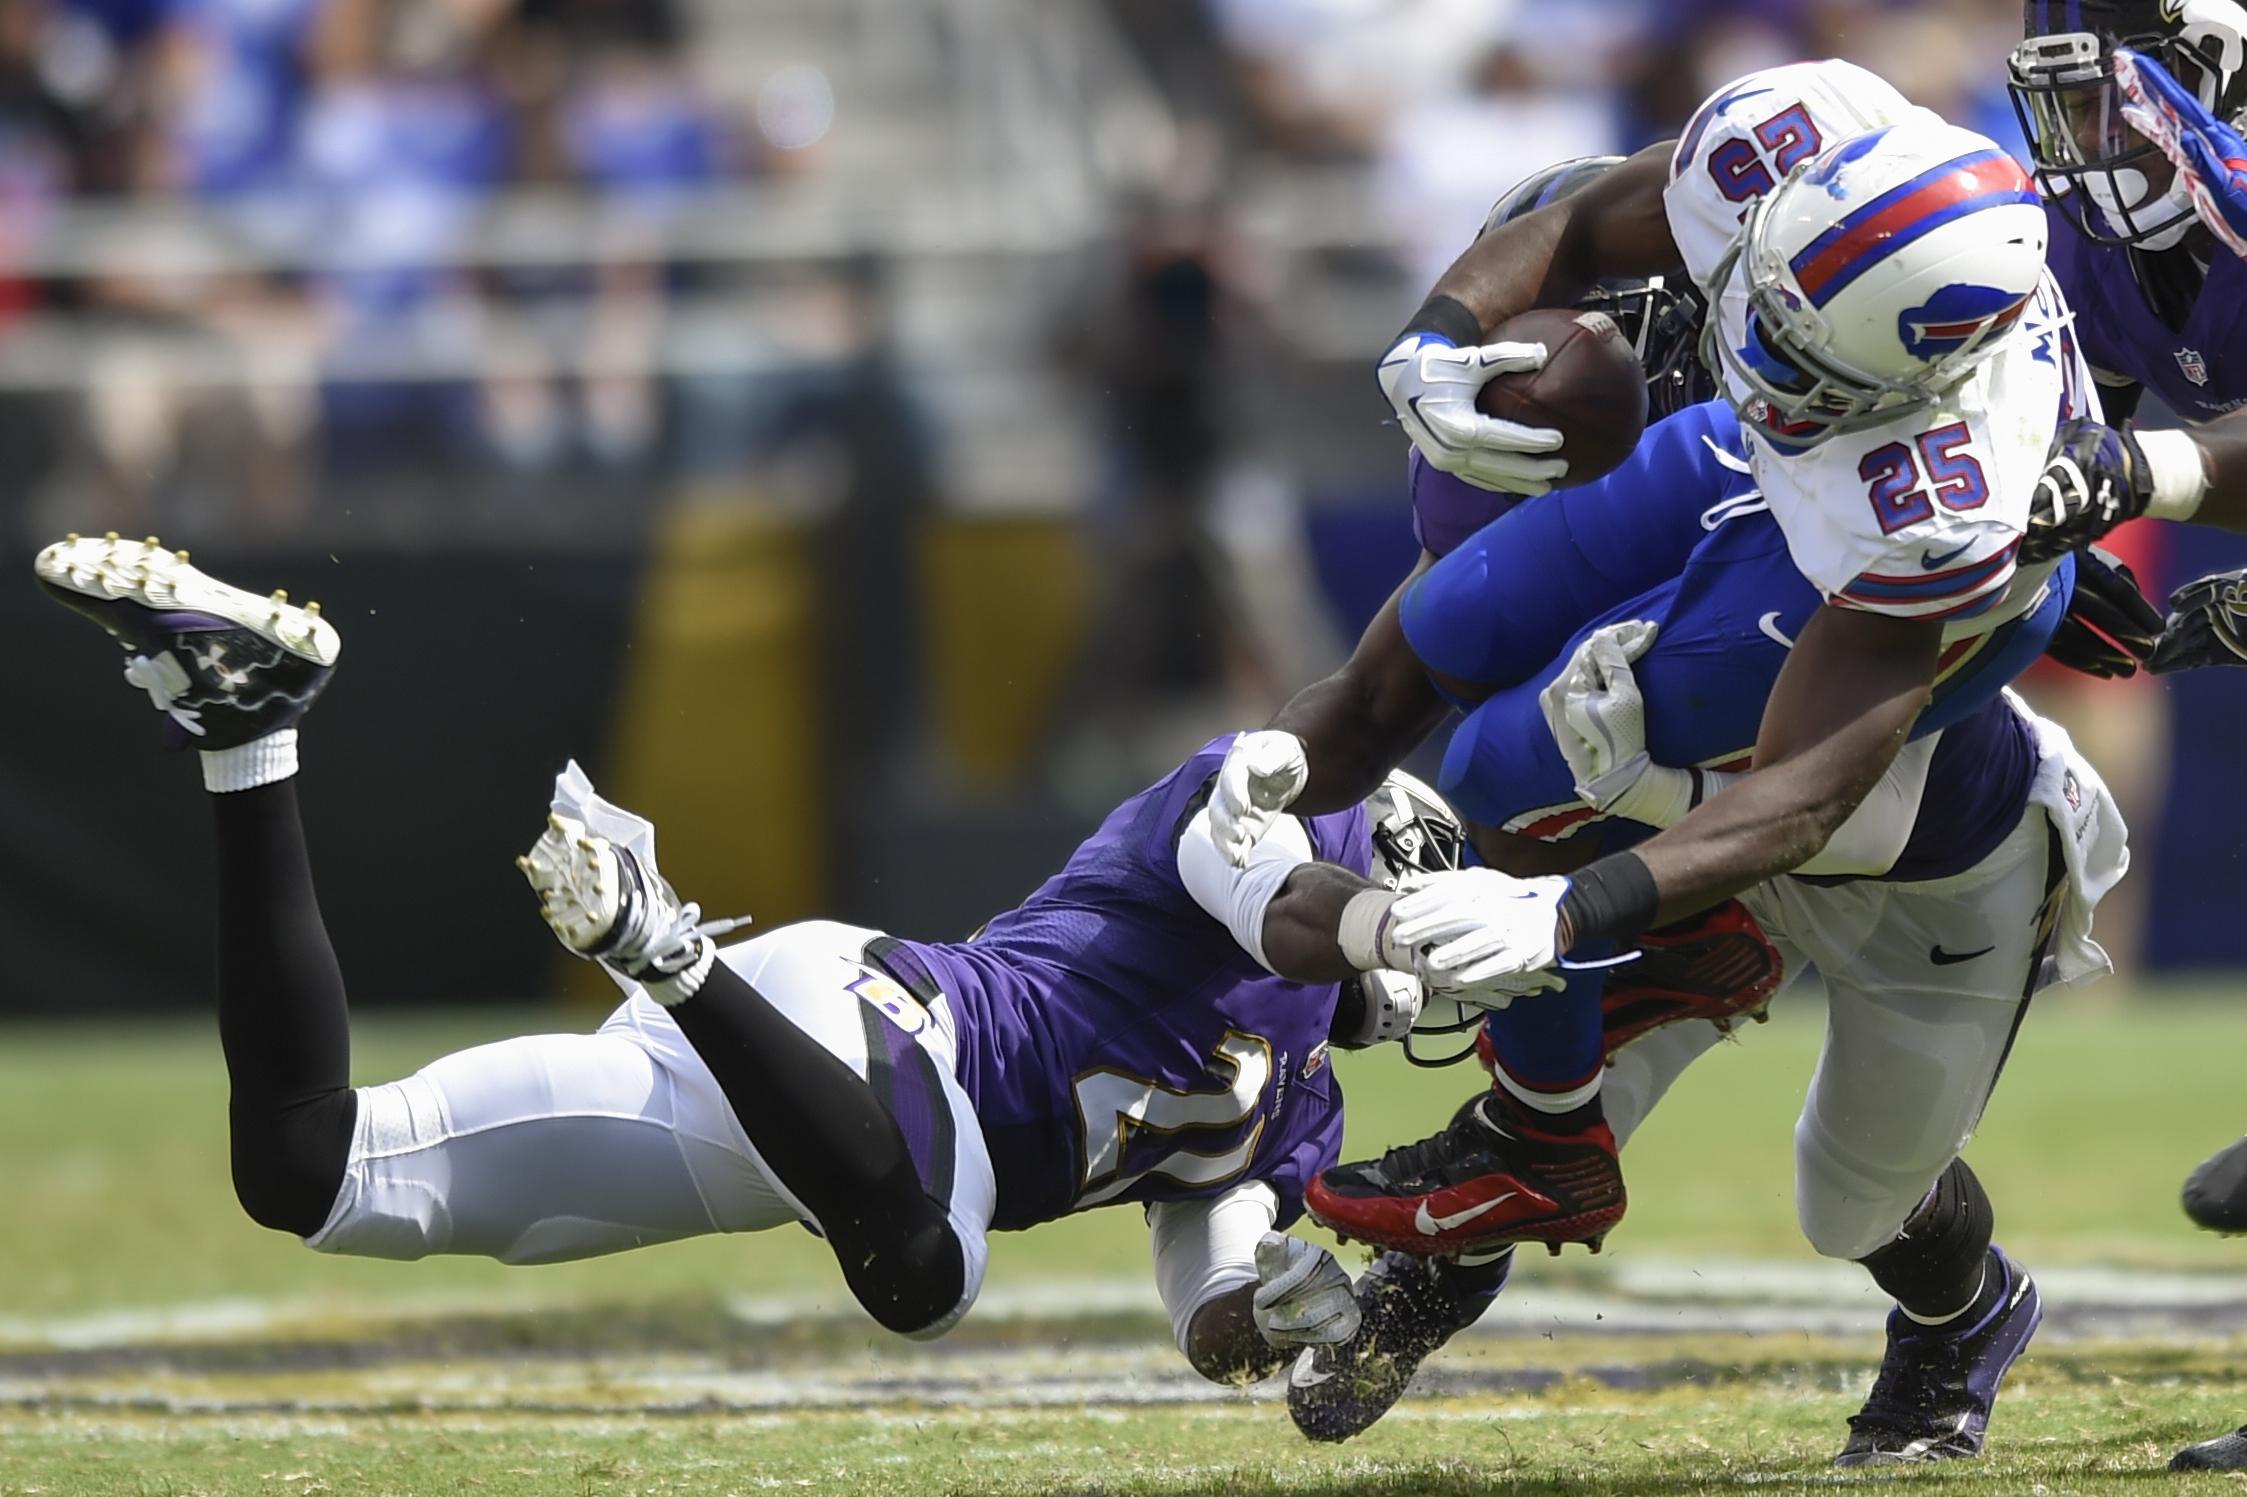 Buffalo Bills running back LeSean McCoy (25) is upended by Baltimore Ravens cornerback Lardarius Webb (21) during the second half of an NFL football game n Baltimore, Sunday, Sept. 11, 2016. (AP Photo/Gail Burton)